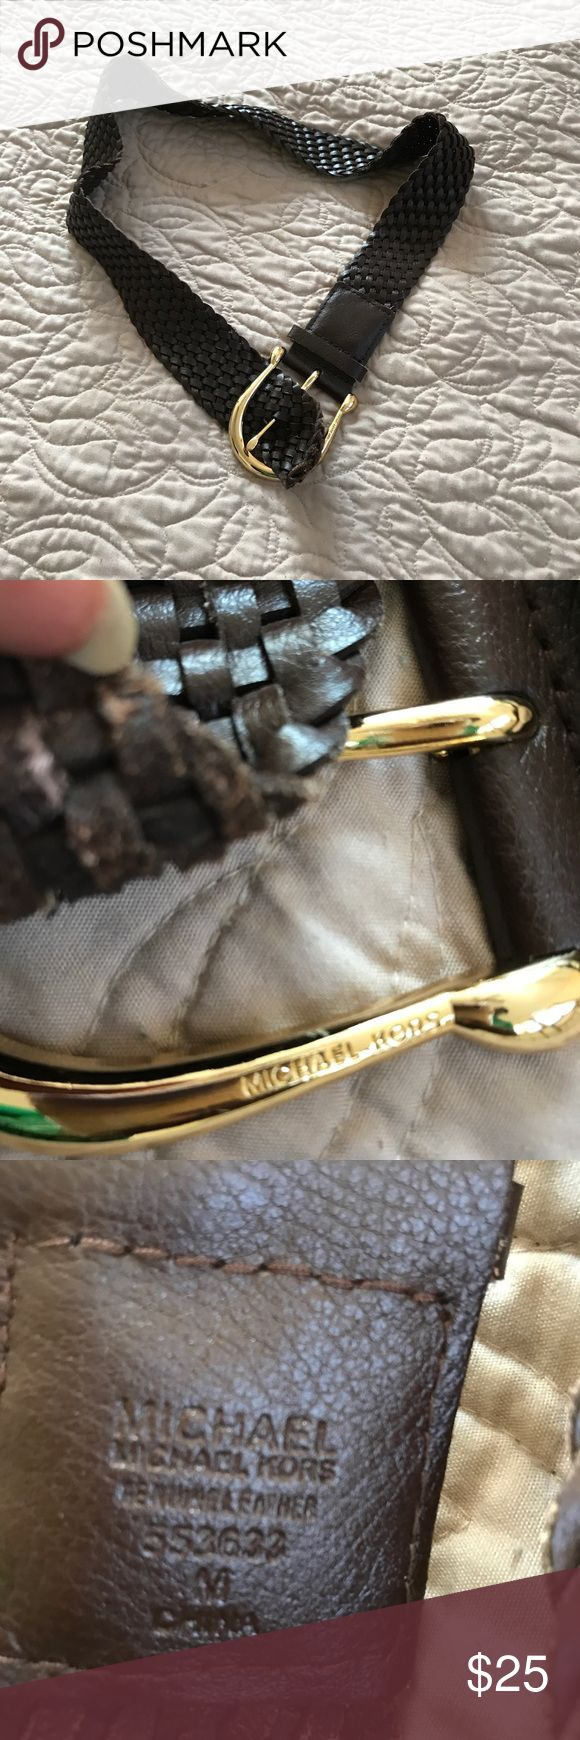 Michael Kors brown leather braided belt. Sz. Med. Michael Kors brown leather braided belt. Sz. Med.43 inches long total. Michael Kors Accessories Belts